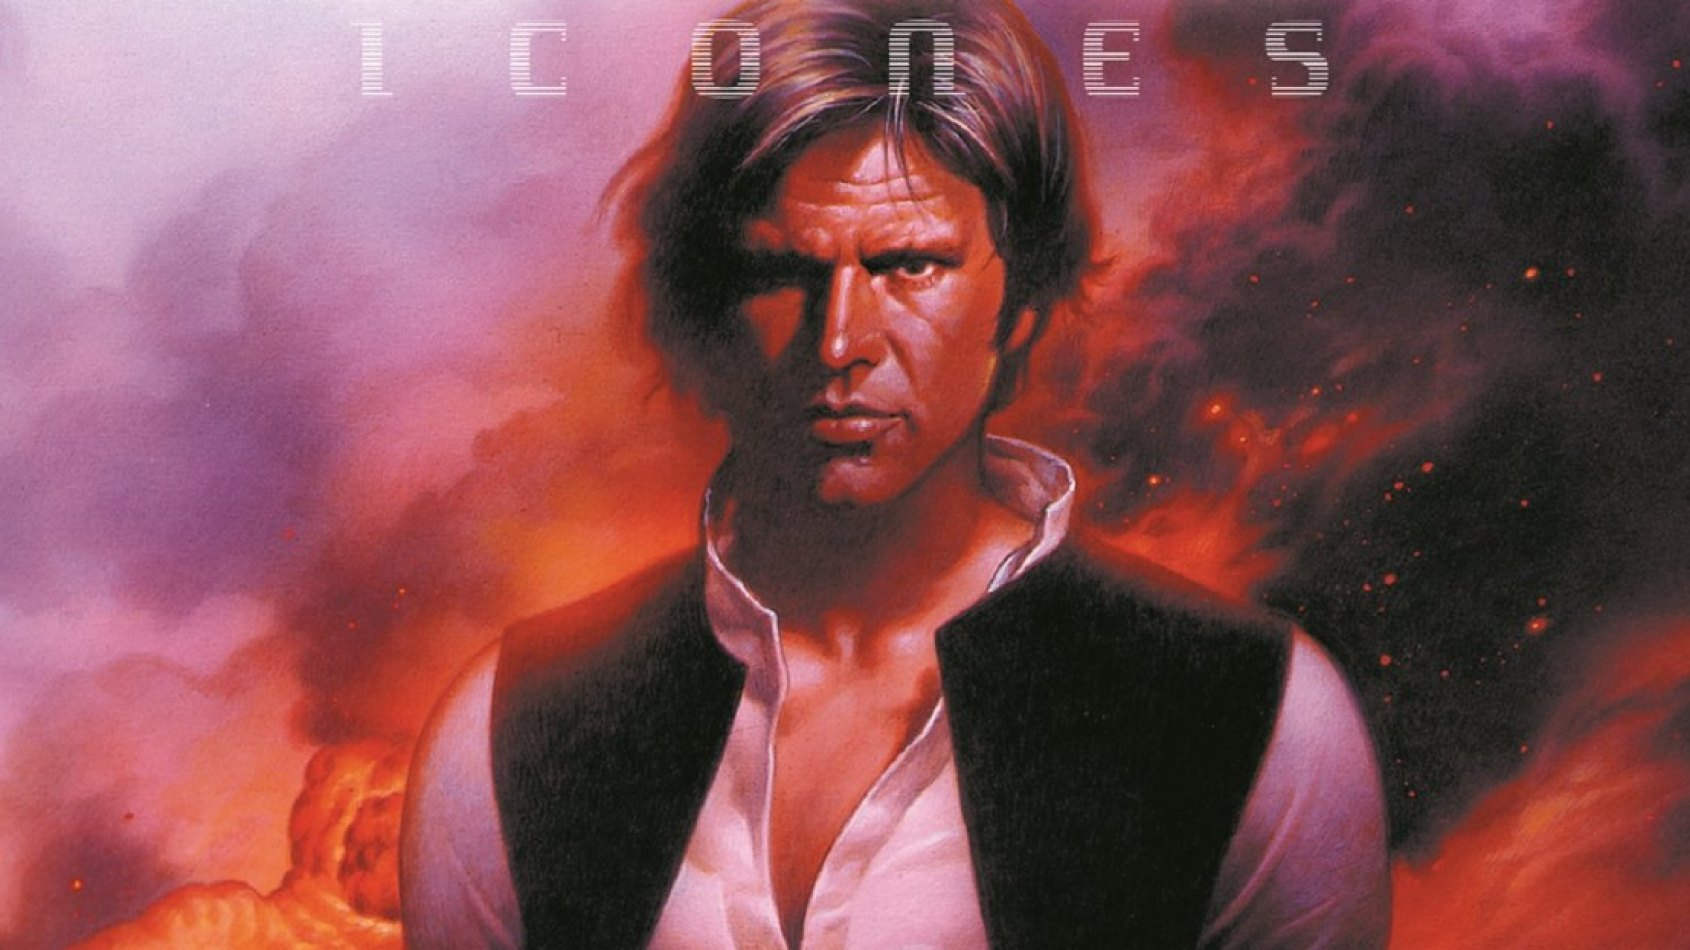 Delcourt : Sortie de l'album Han Solo